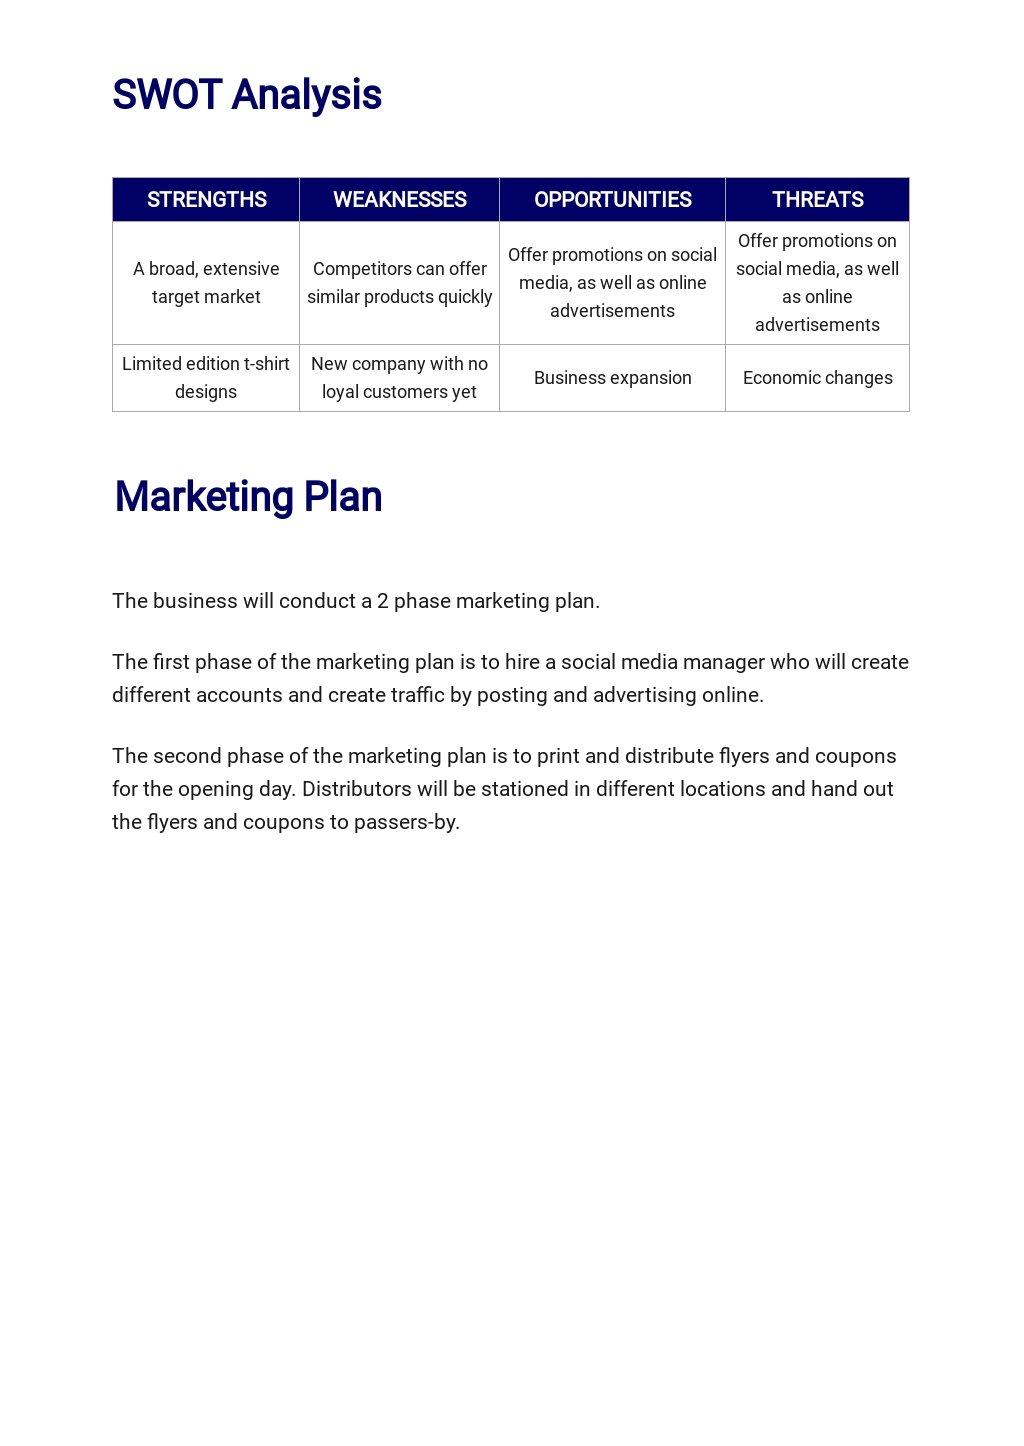 T Shirt Company Business Plan Template 3.jpe